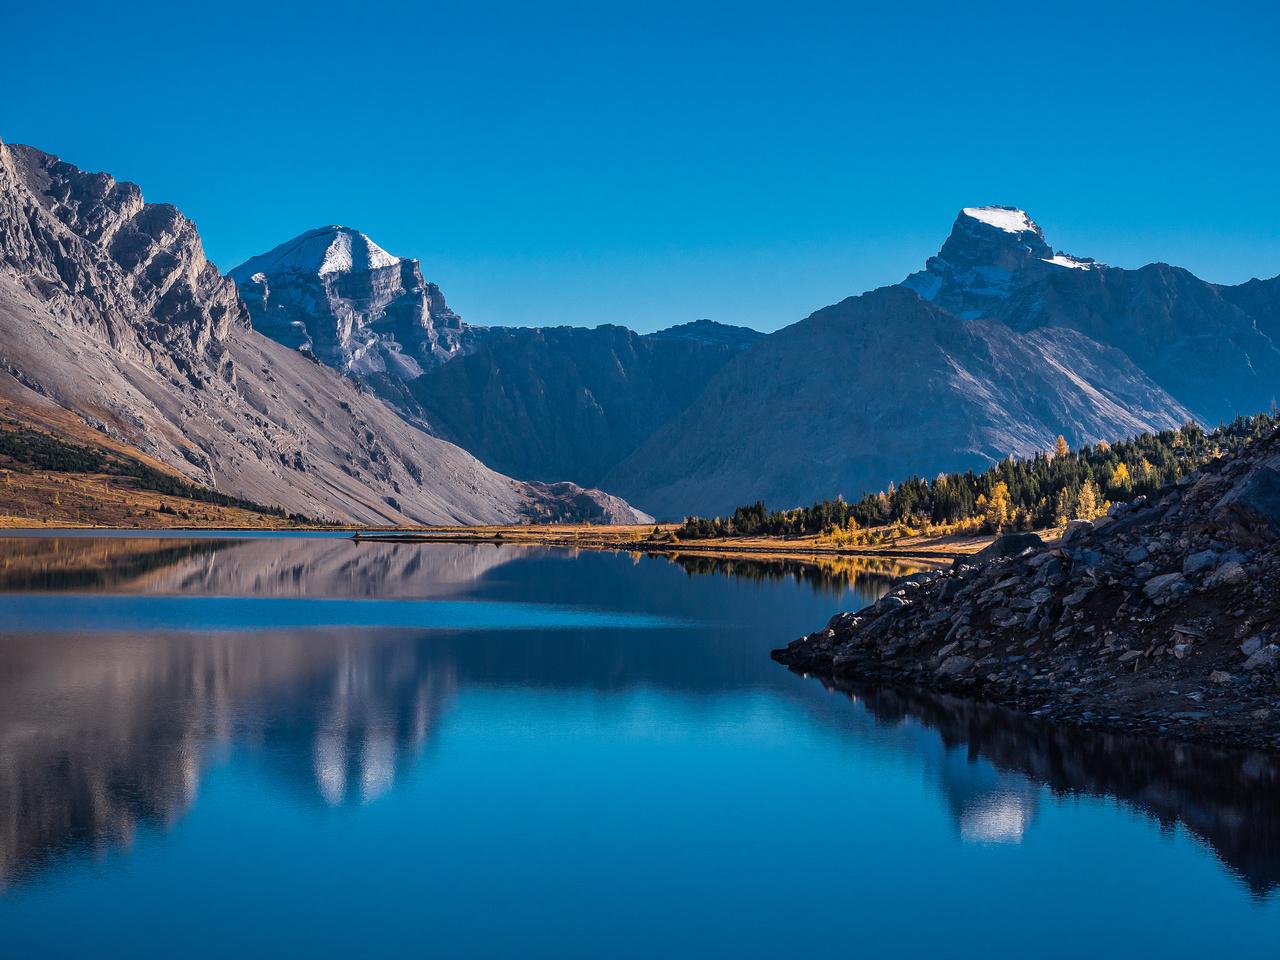 Mount Douglas and St. Bride reflect in Ptarmigan Lake.